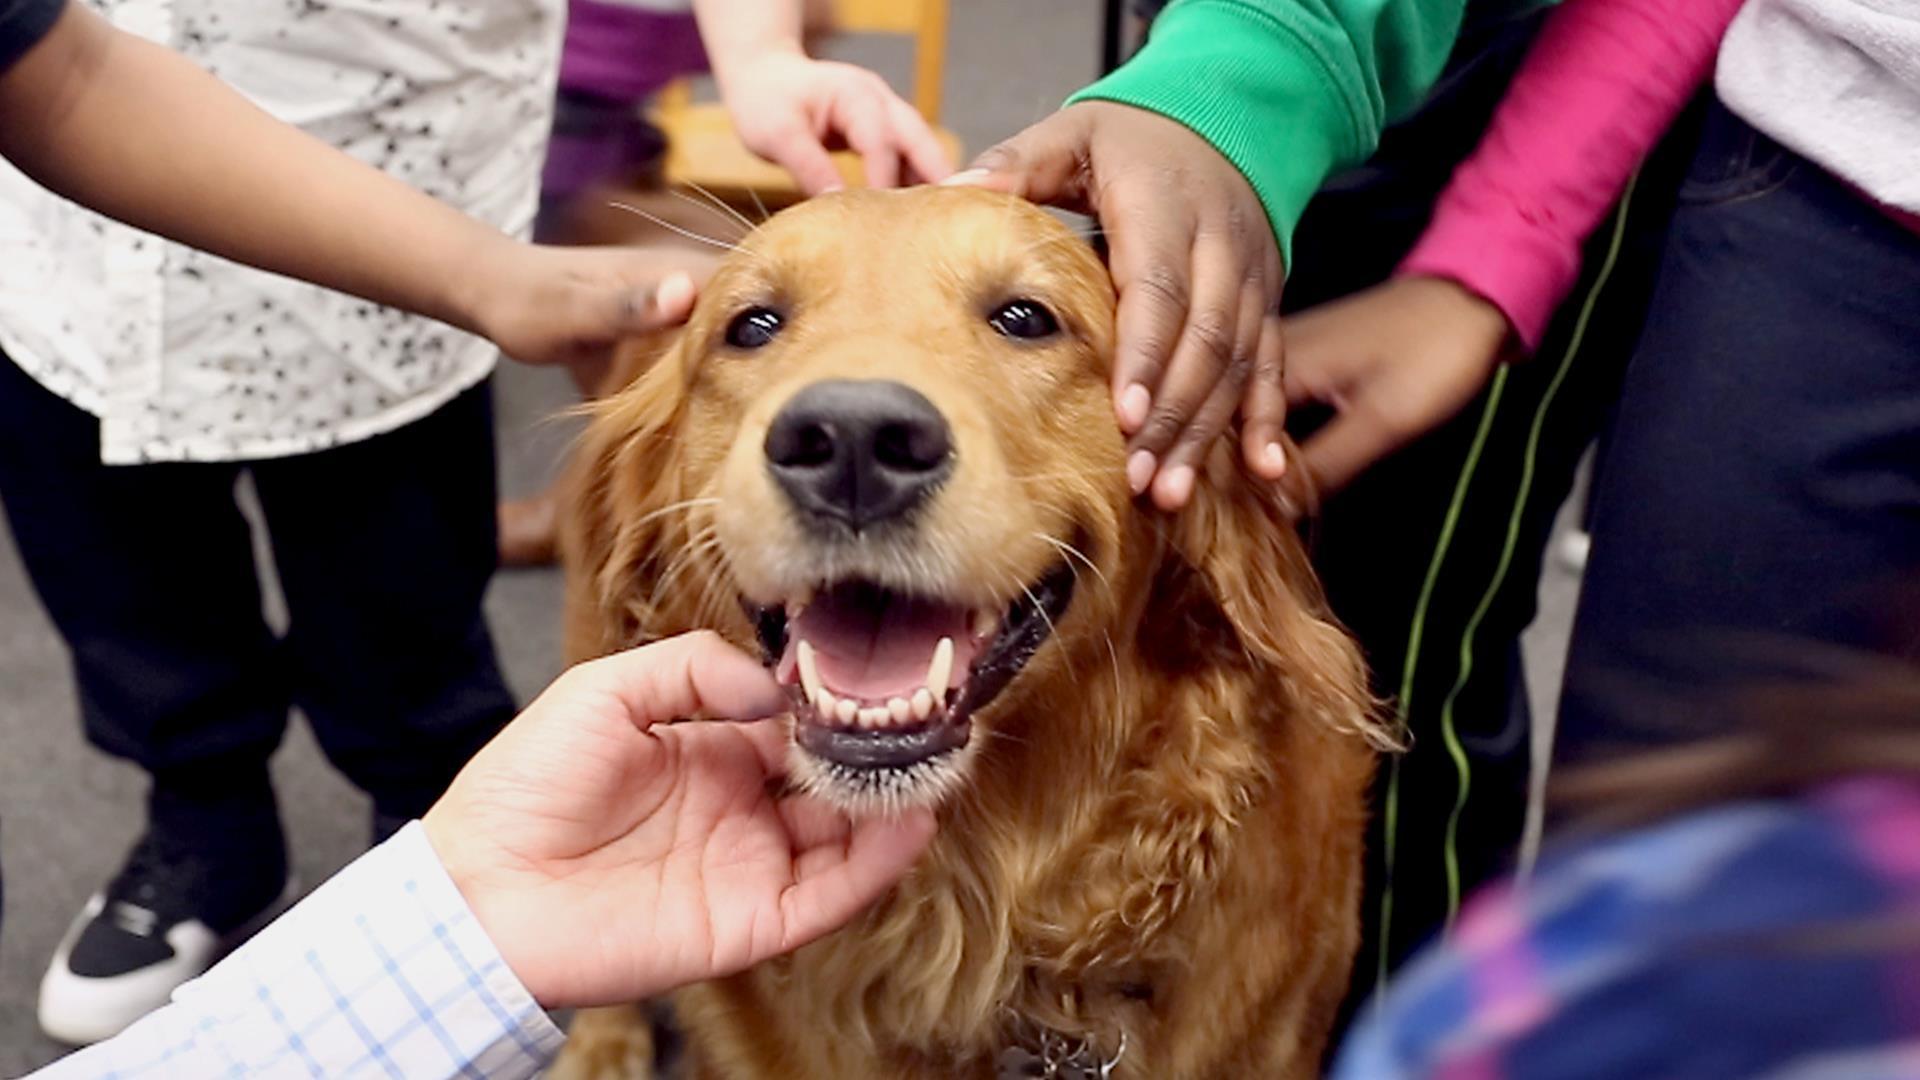 x_tdy_ov_pets_hugging_dog_170228_tease-01.jpg